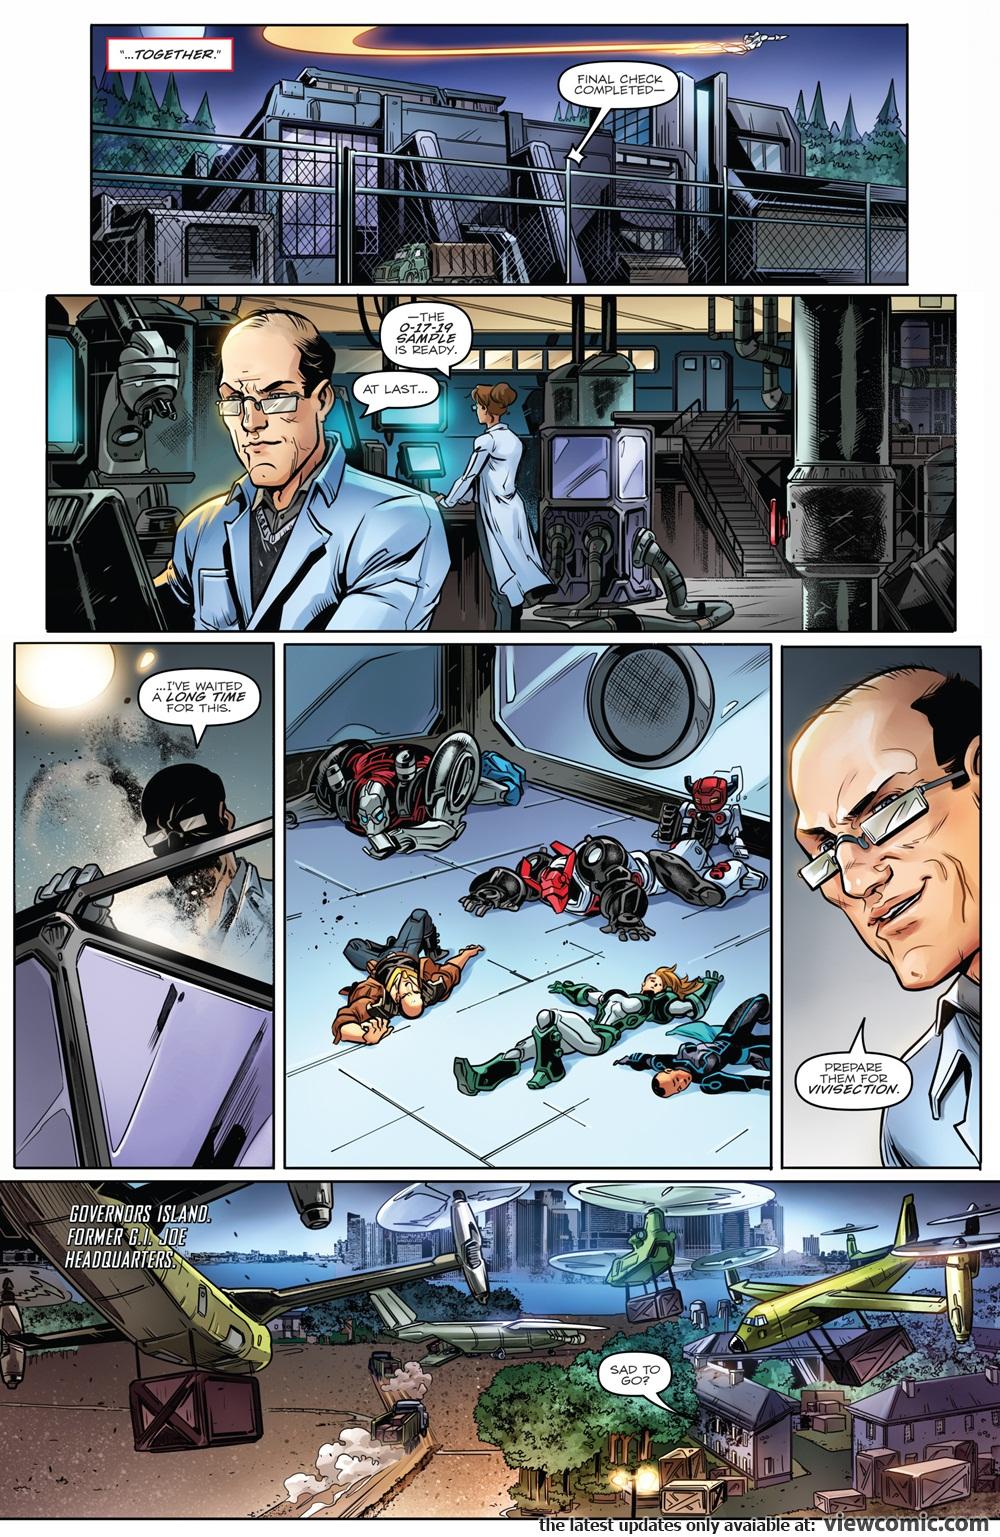 Revolution 005 (2016) . | Vietcomic.net reading comics online for free